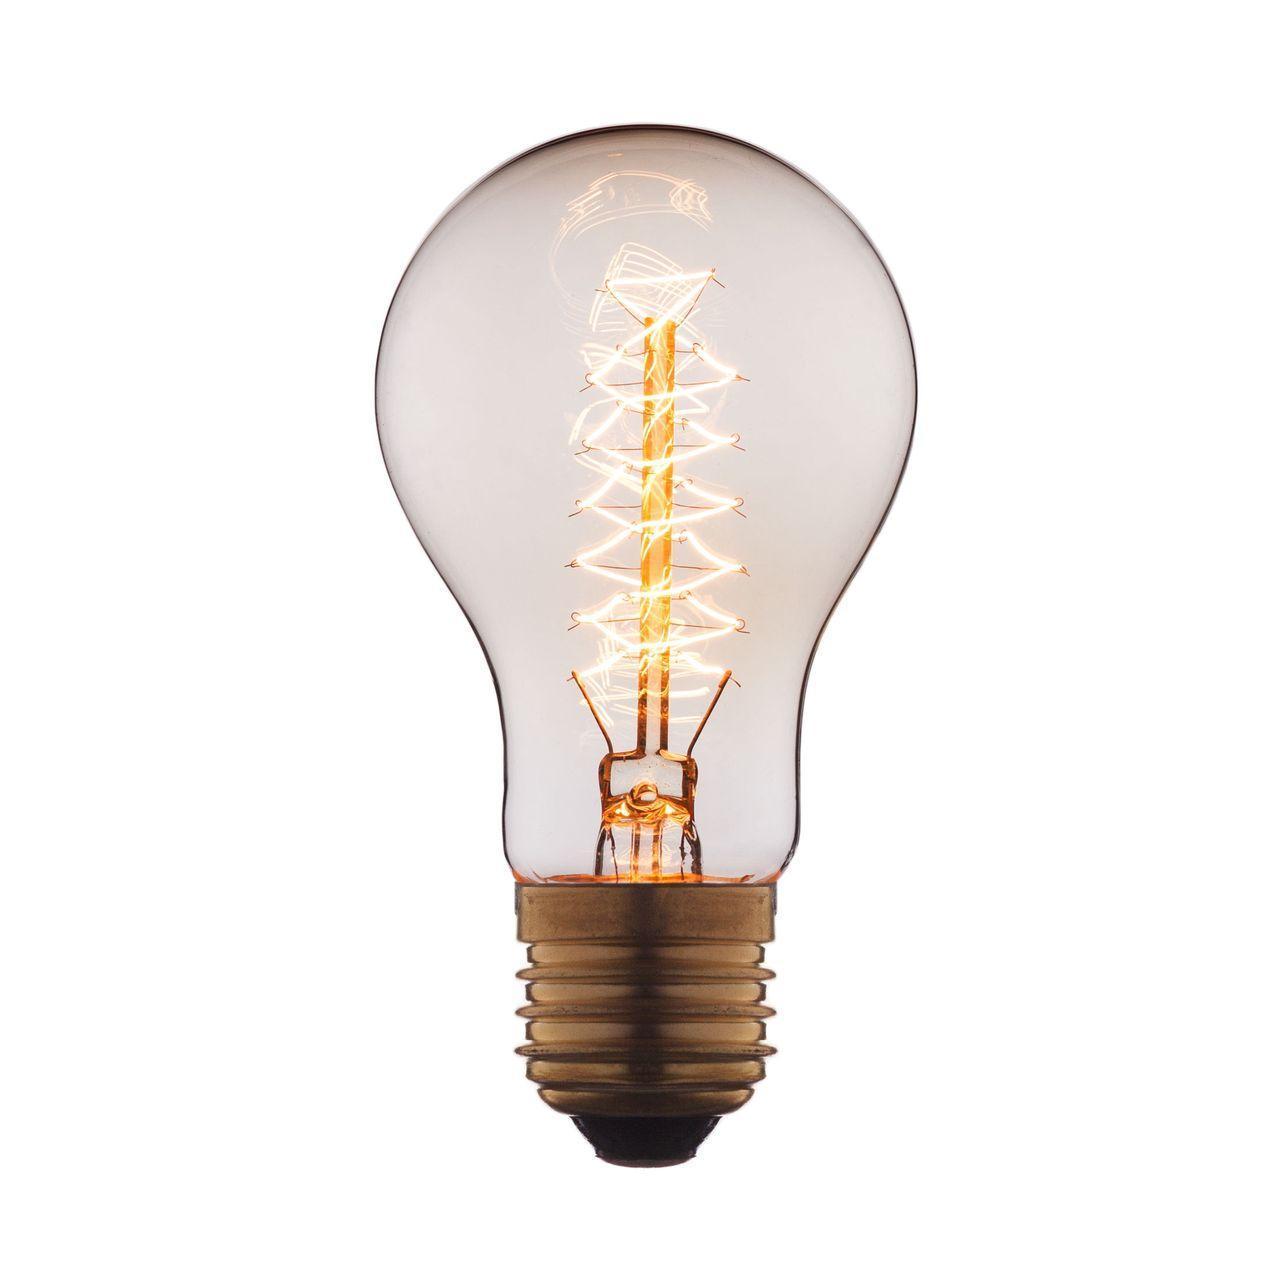 Лампа накаливания E27 40W прозрачная 1003 loft it лампа накаливания loft it трубчатая прозрачная e27 40w 30310 h